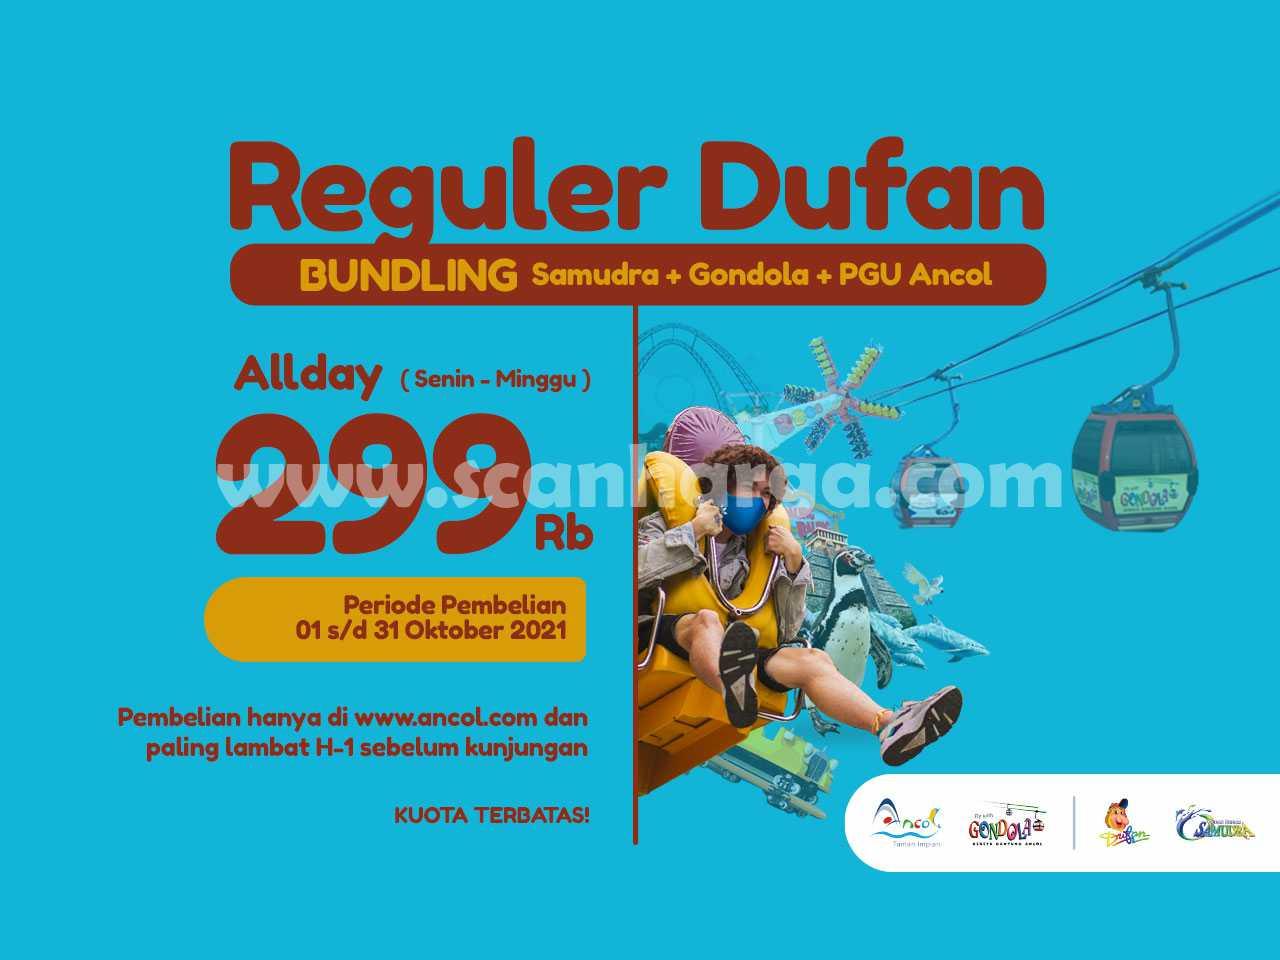 Promo DUFAN Reguler Paket BUNDLING hanya Rp. 299.000